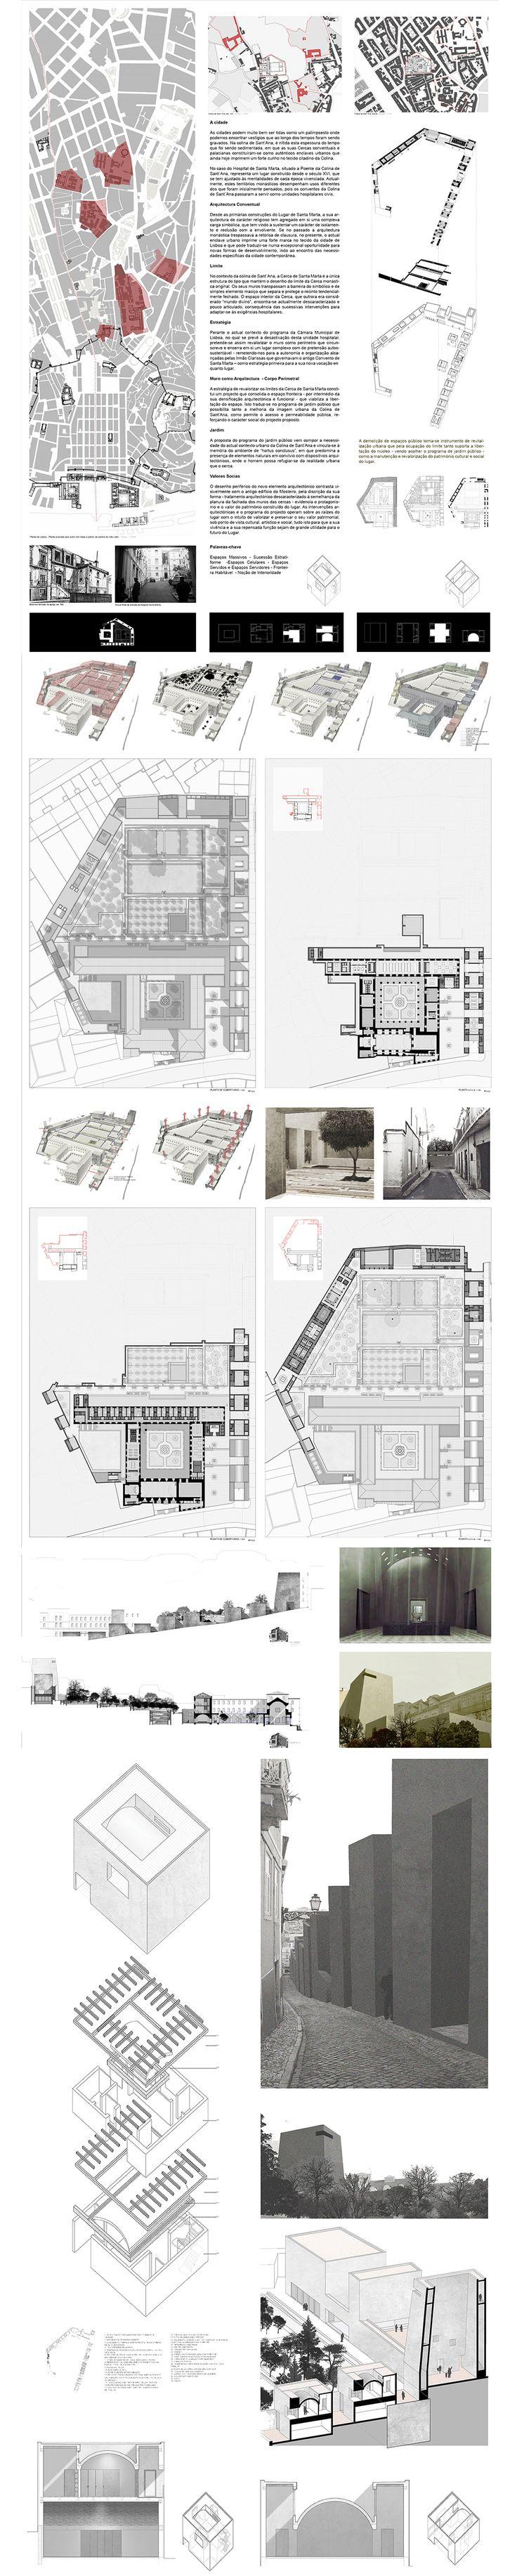 "Idea competiton ' LABJOVEM"" . 1st place in architecture . 2016 . Azores #architecture #azores #ulisboa #airesmateus #espacoservidor #murohabitado #espaçaprincipal #limitehabitado"